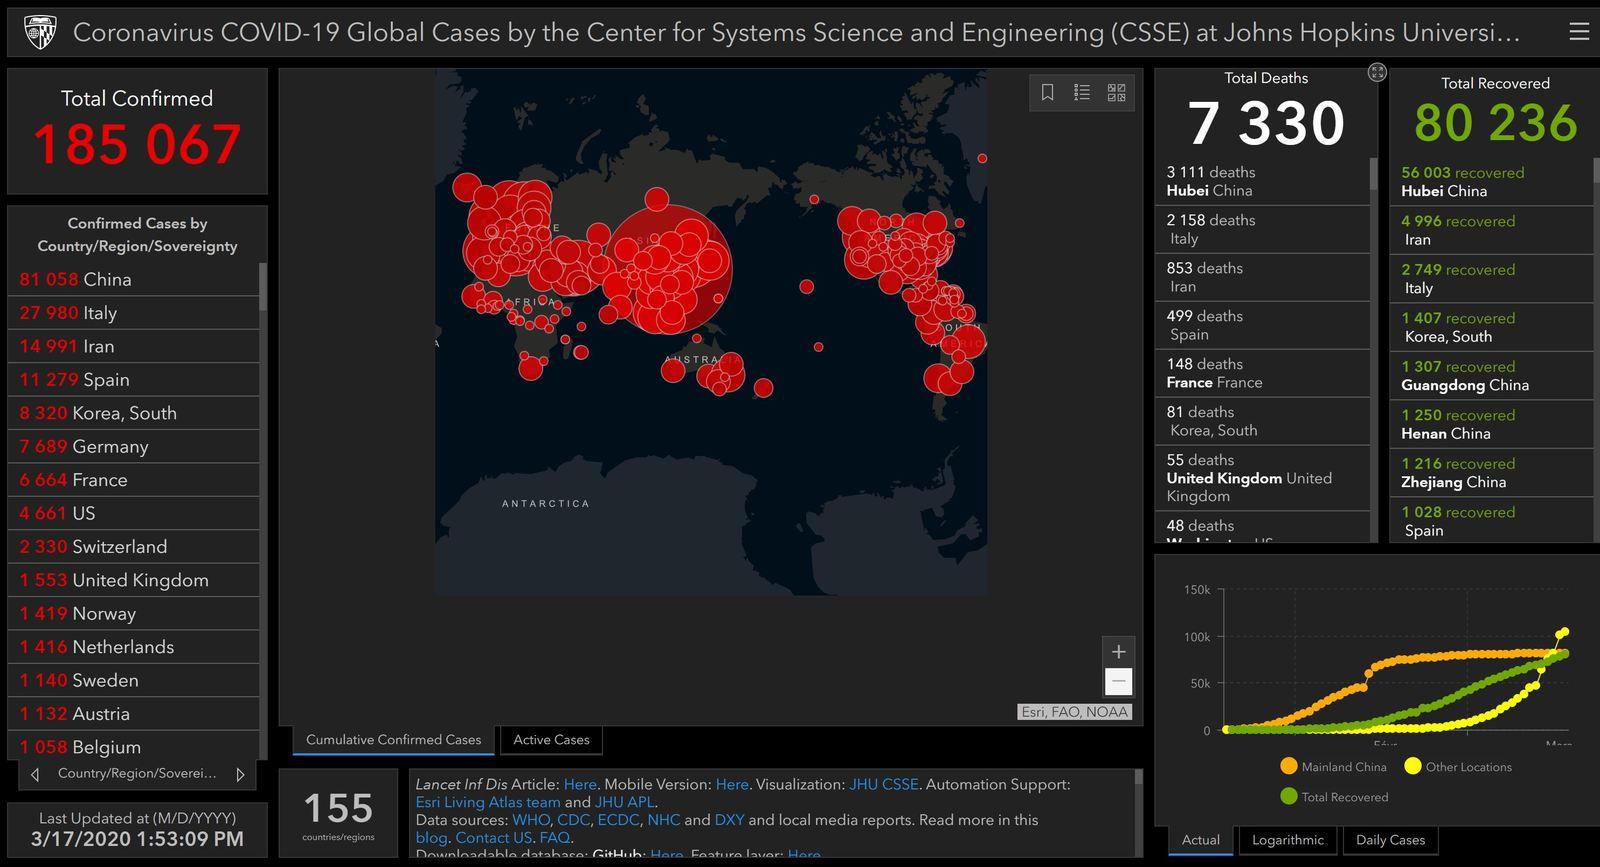 Carte de suivi de l'épidémie de Coronavirus Covid-19